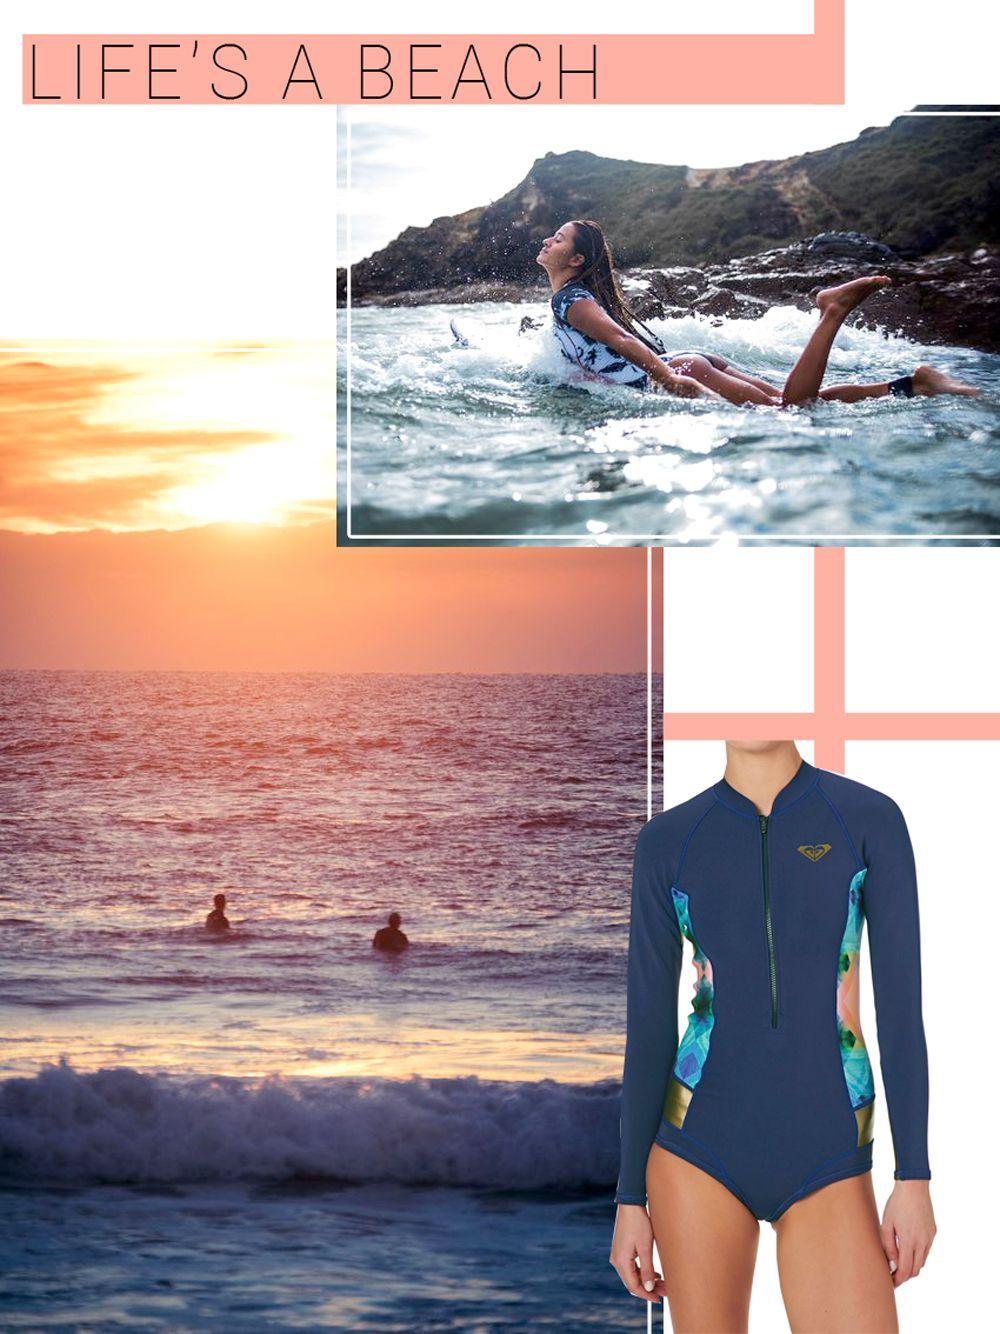 Surfing: Beach Life